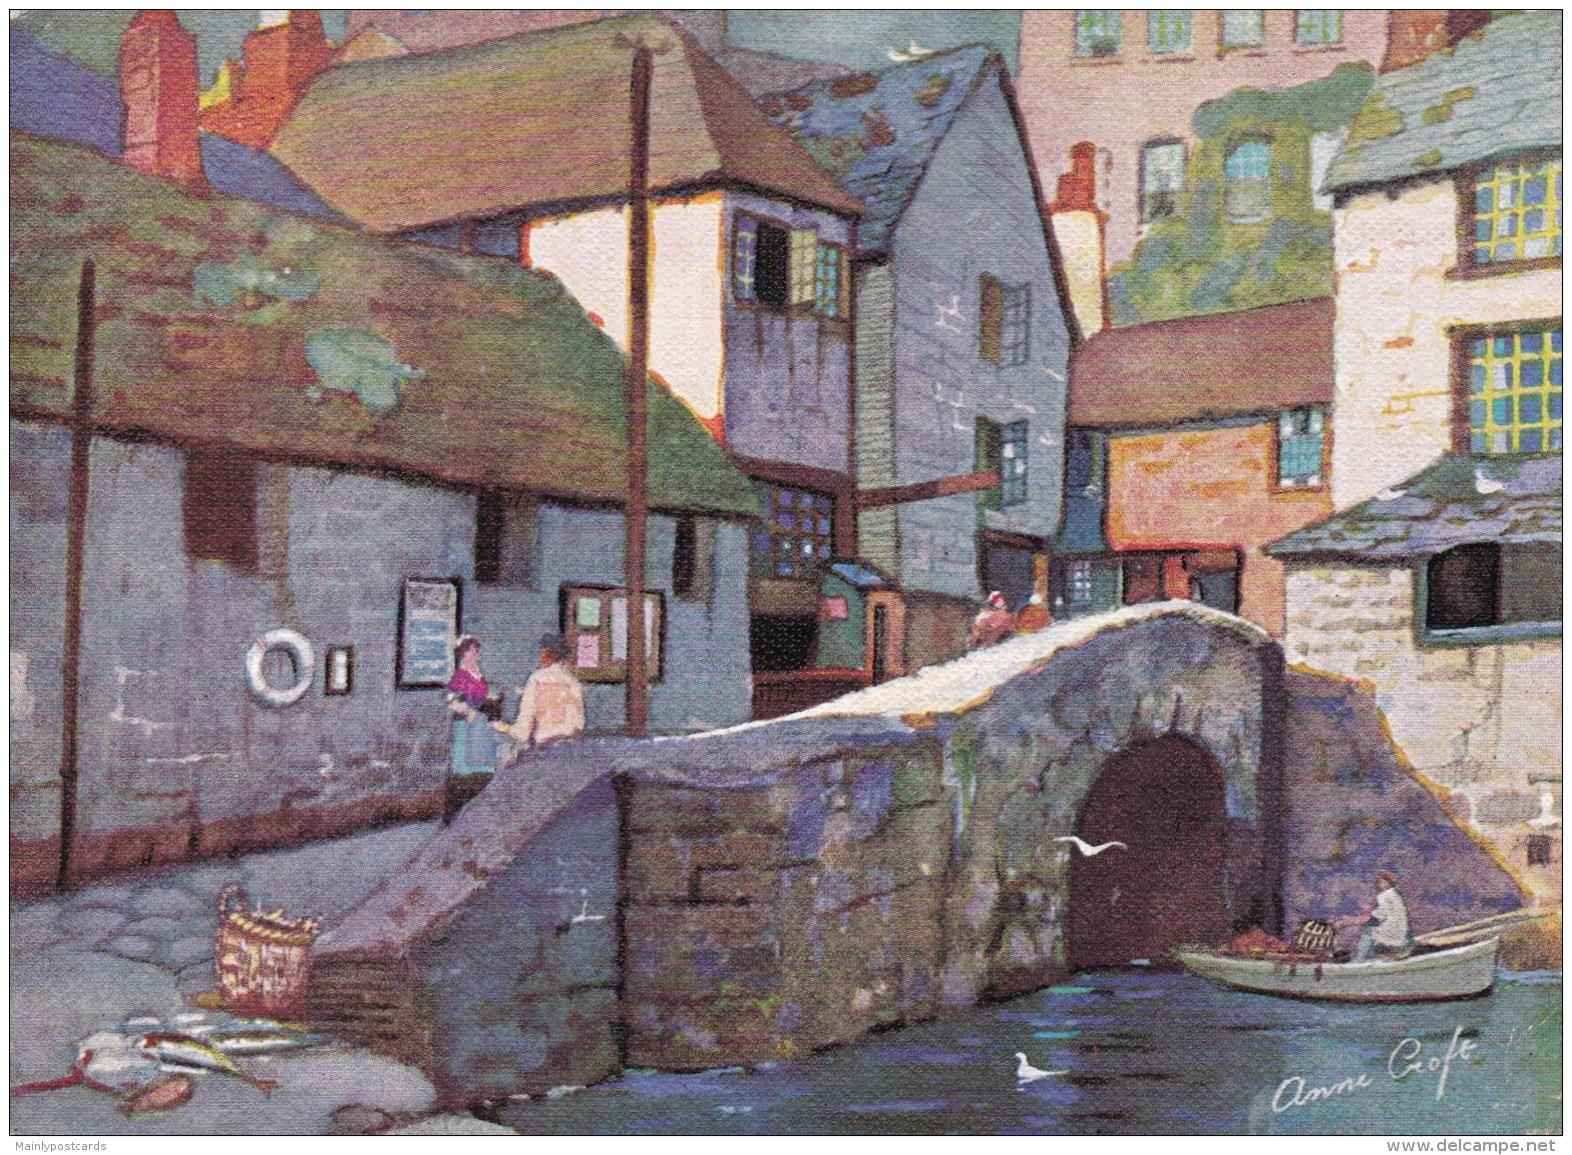 AL50 Roman Bridge, Polperro - Artist Signed Anne Croft, Linen - Other